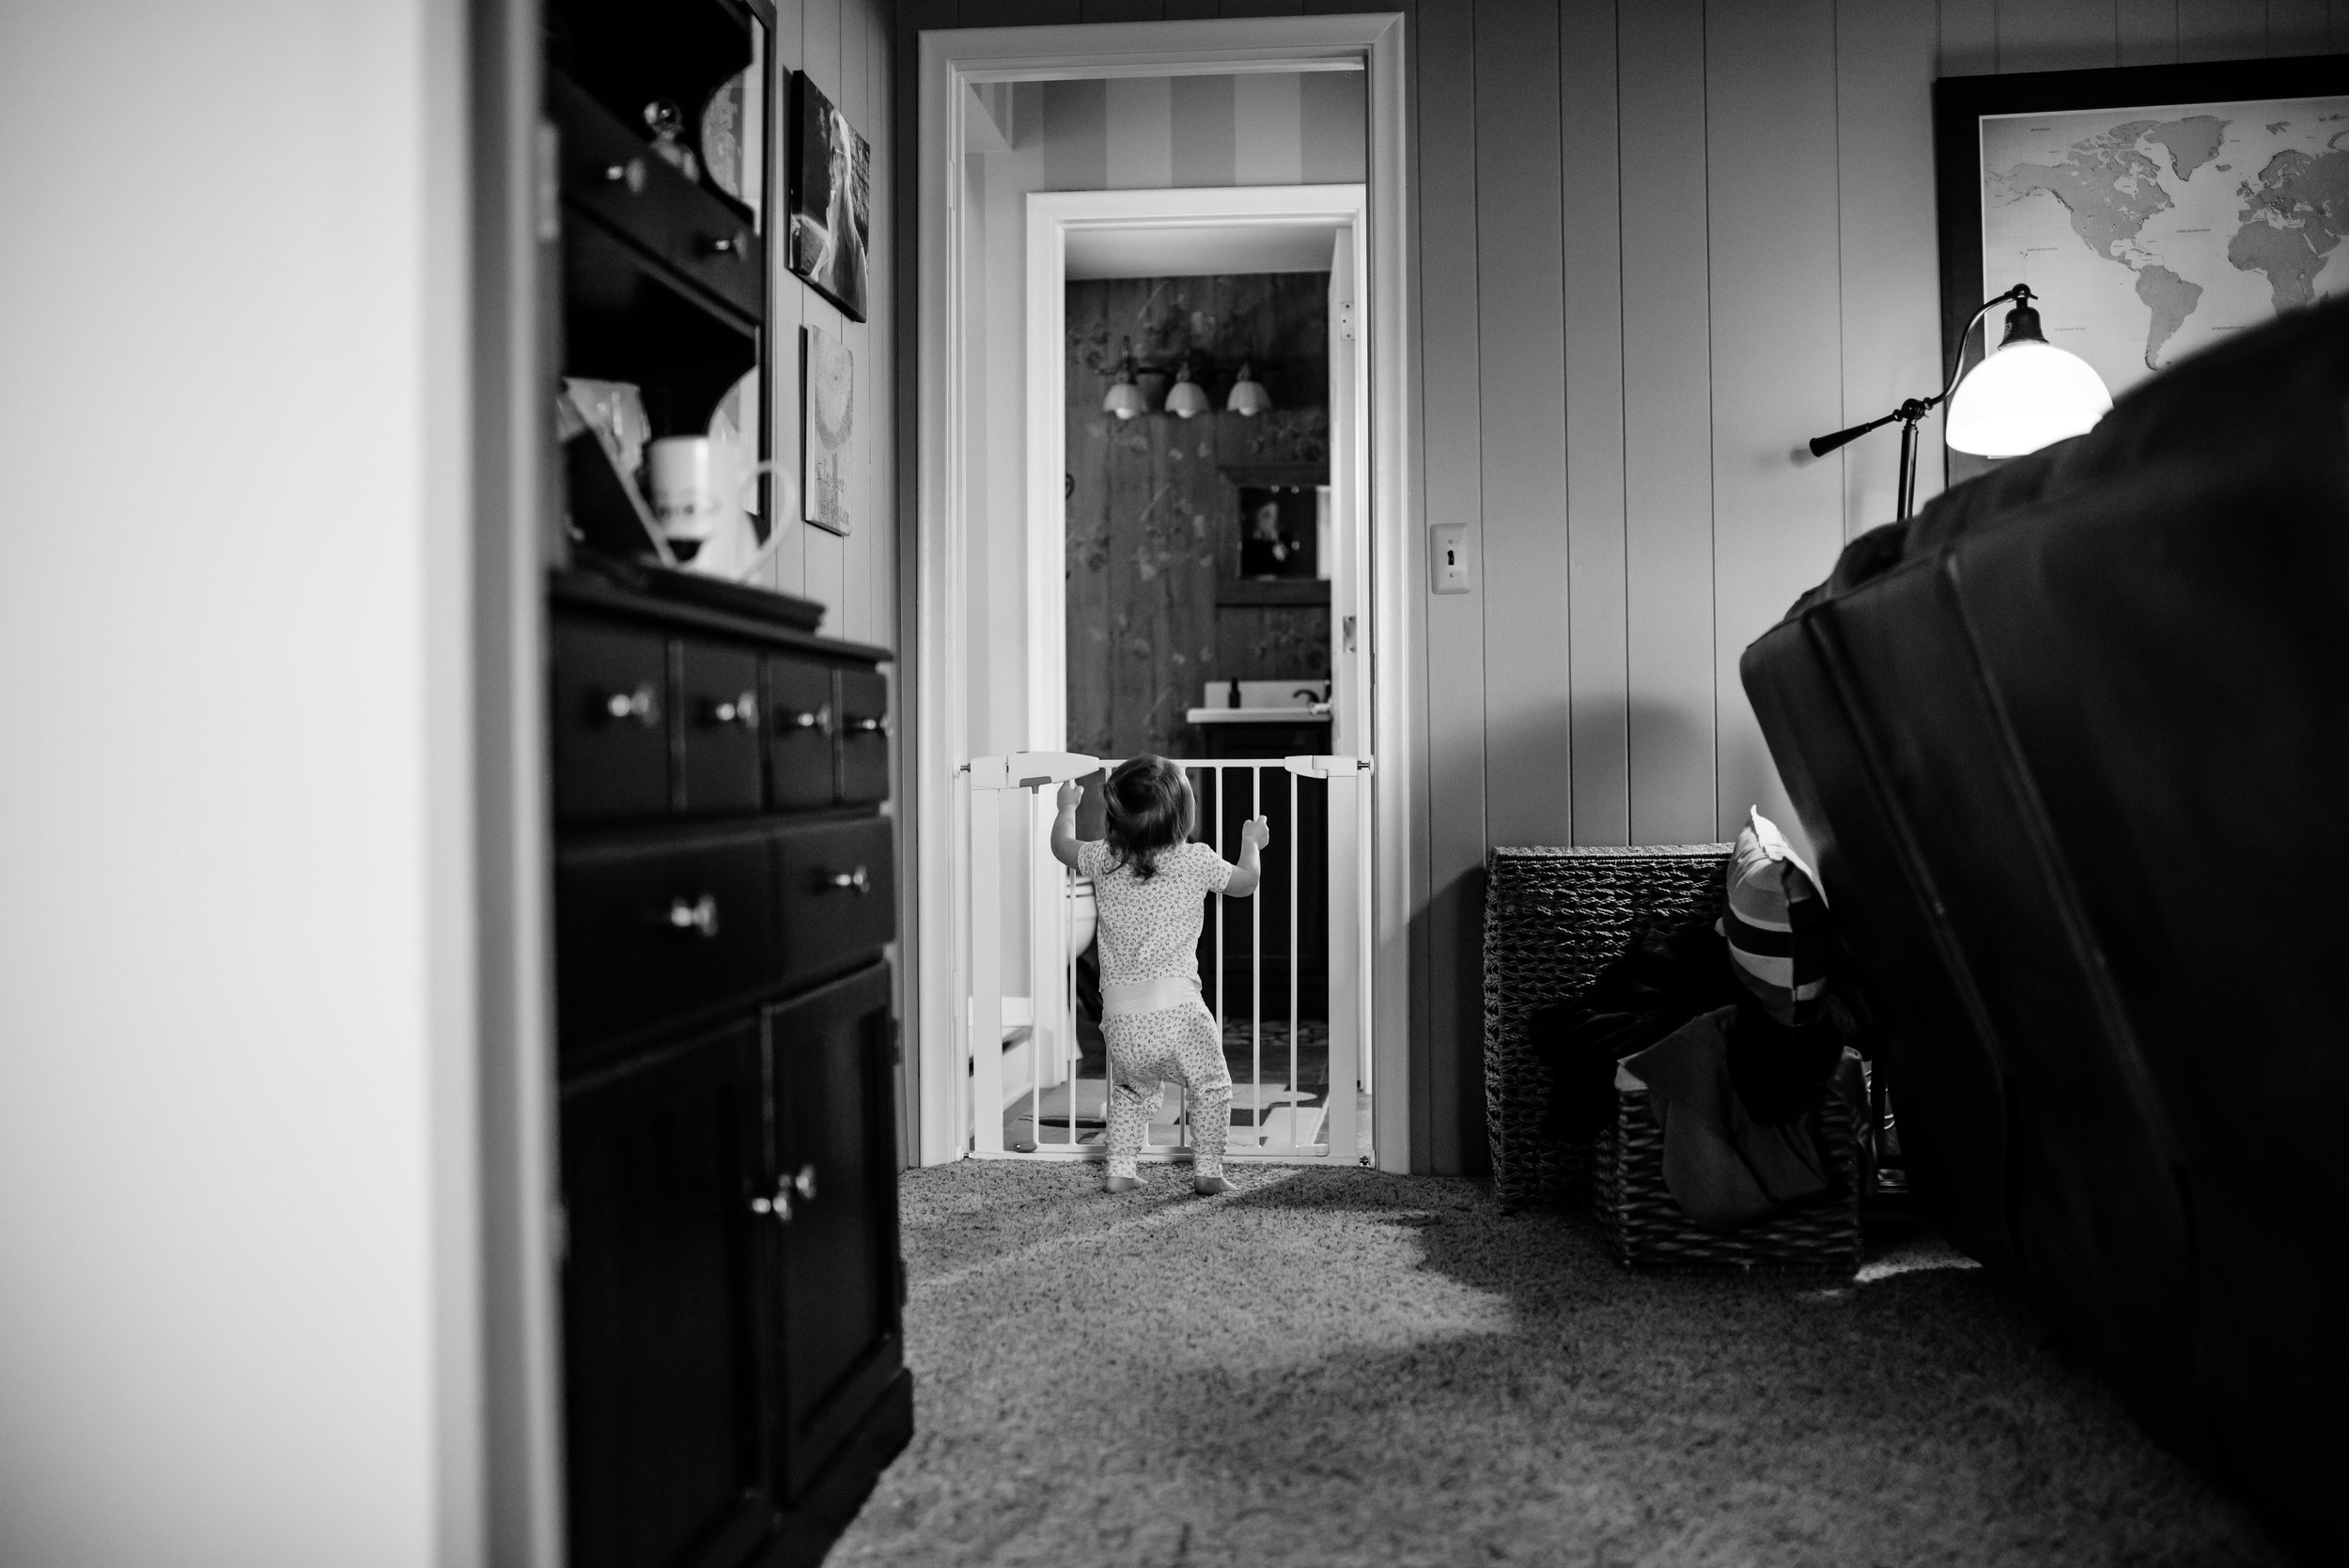 Girl stands at baby gate in doorway